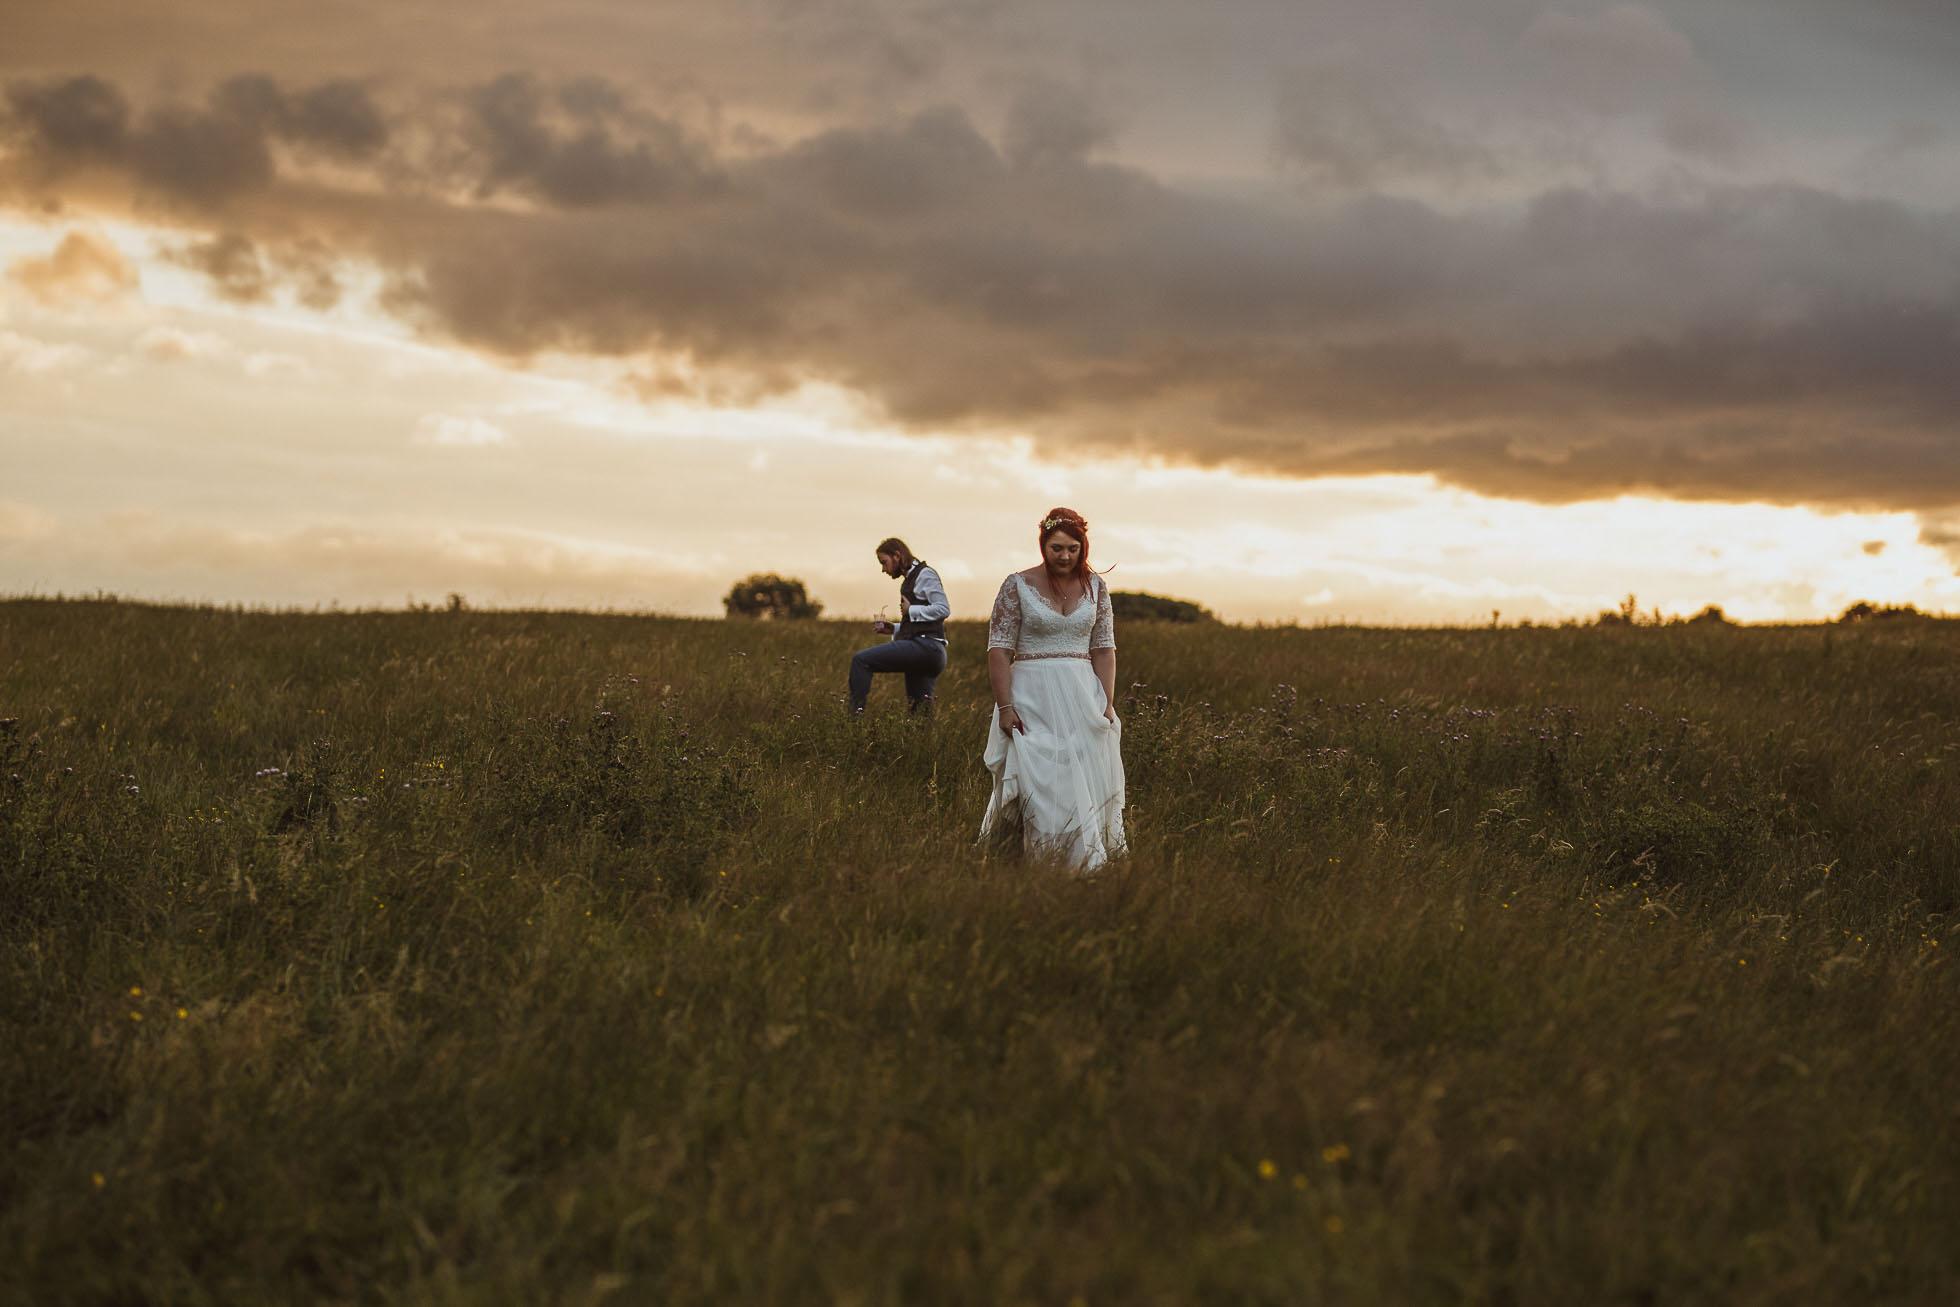 skipbridge_farm_wedding_york-147.jpg